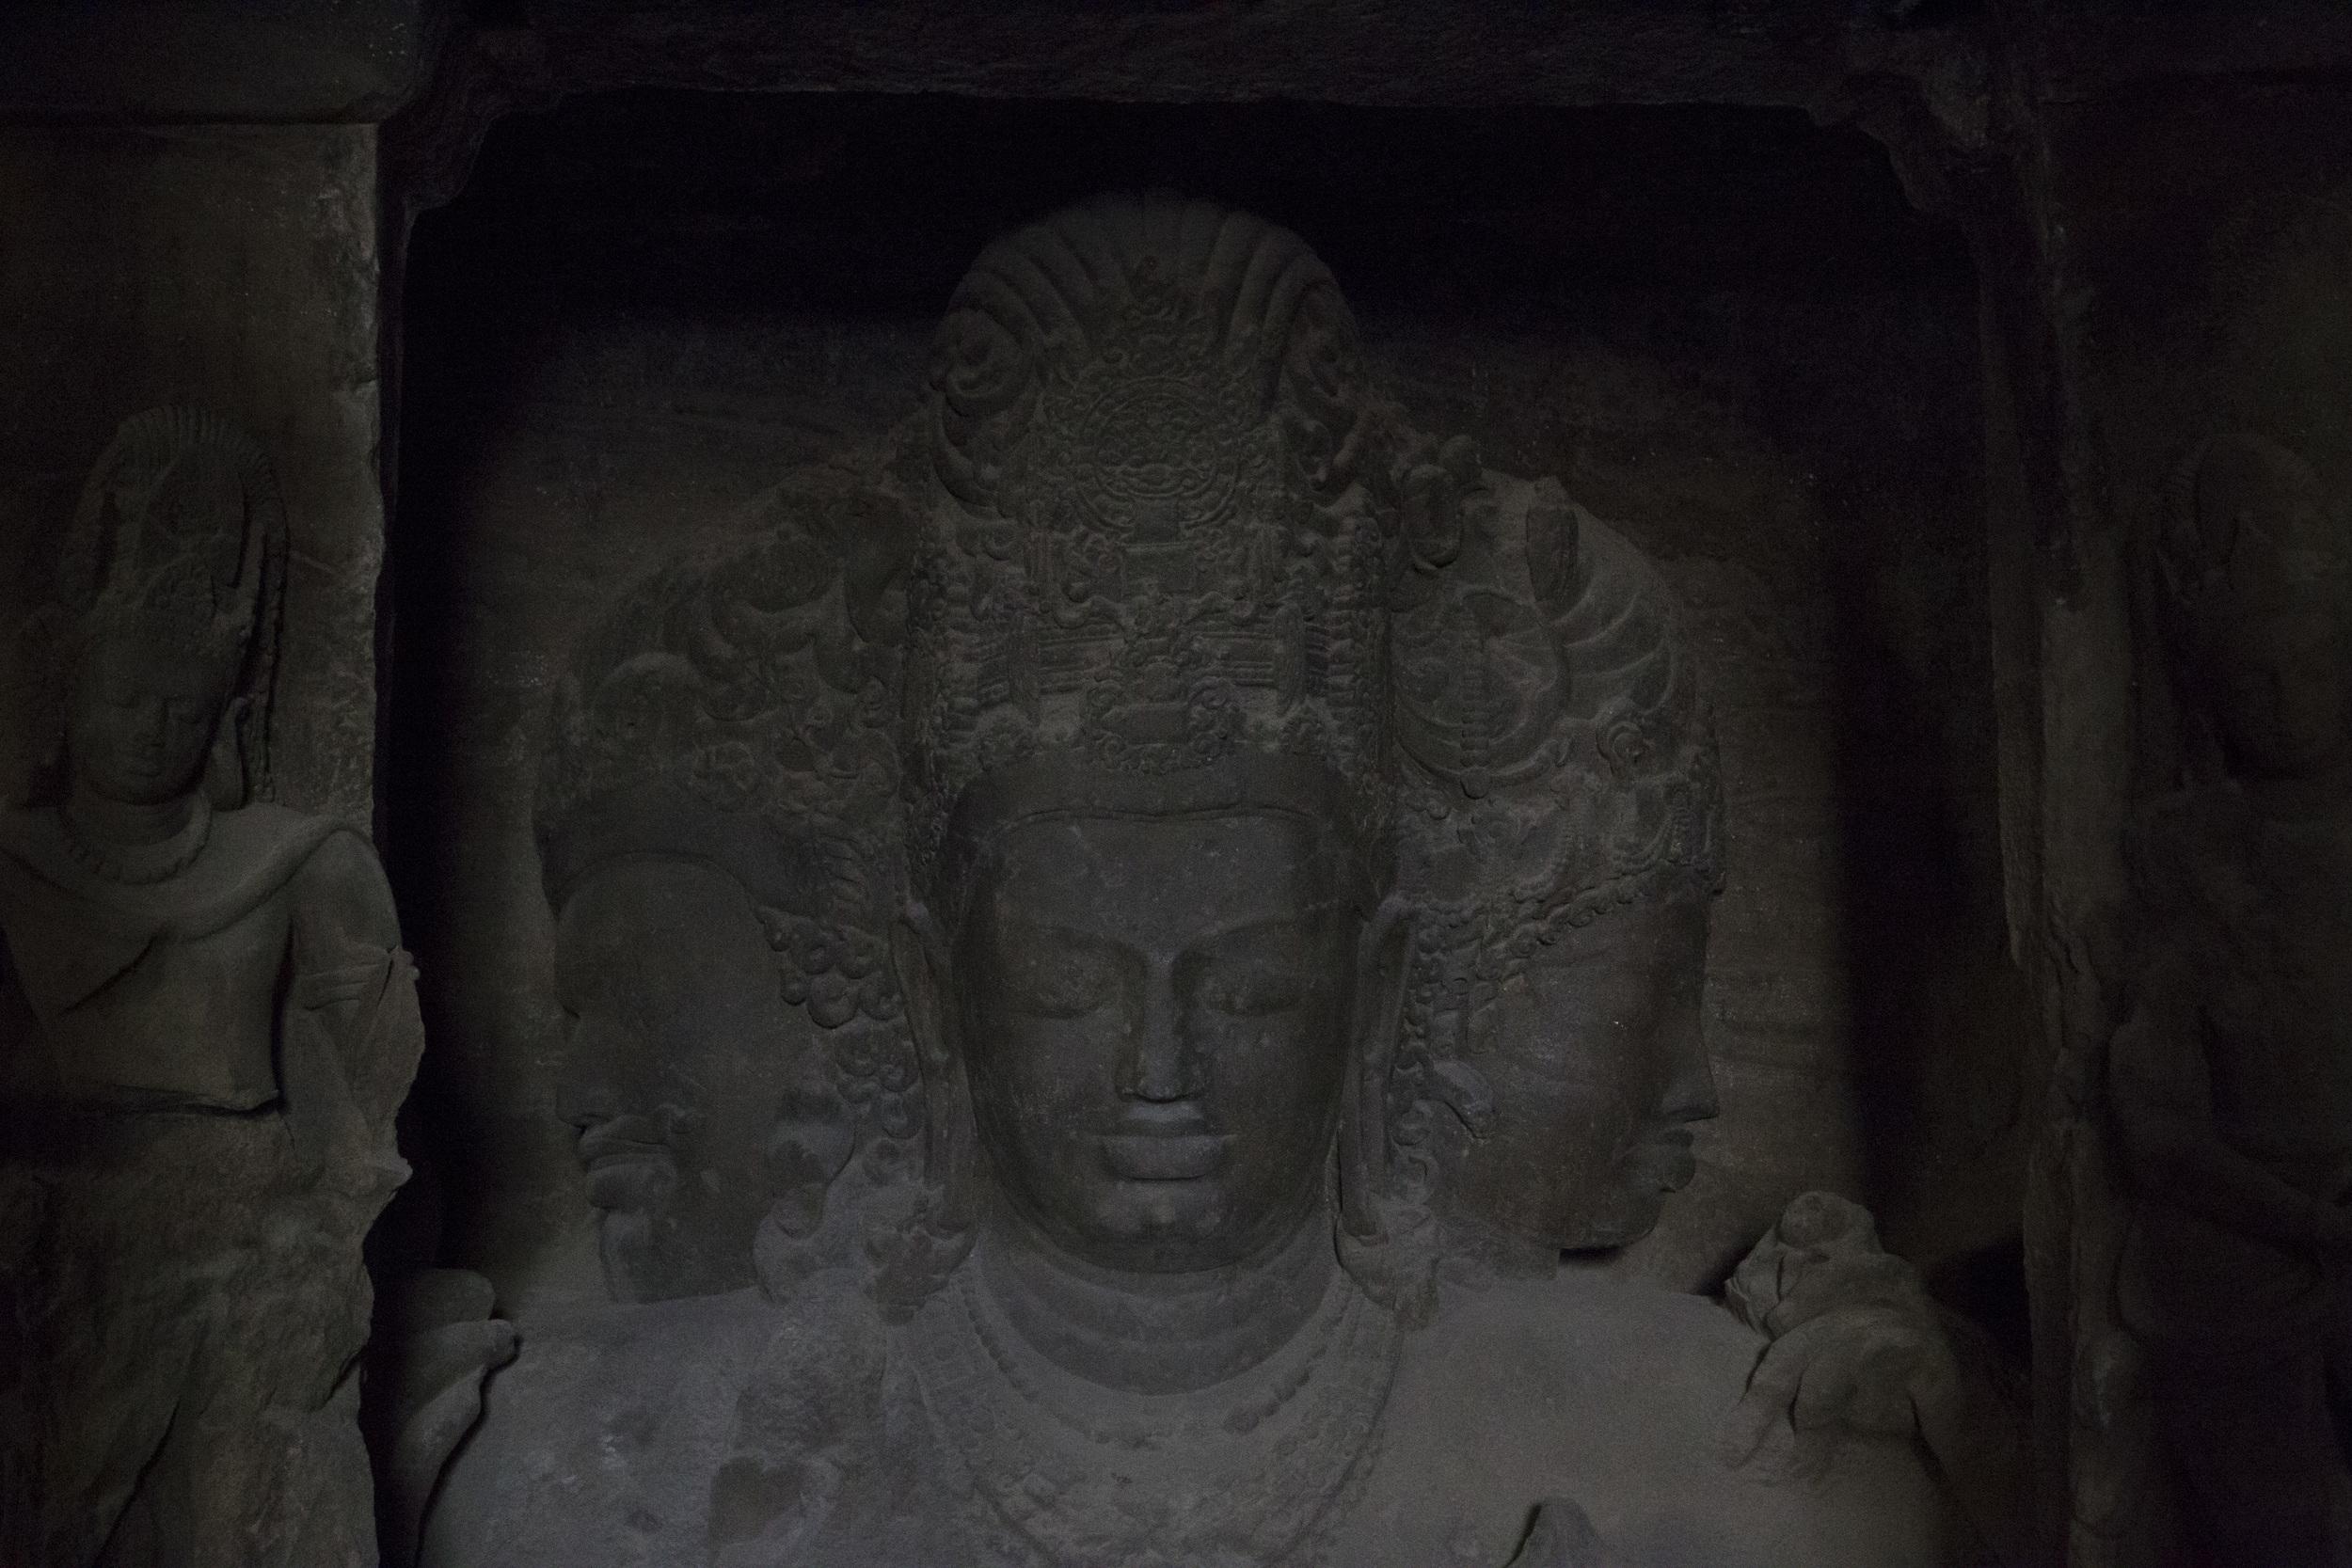 Elephanta Caves, Mumbai, India